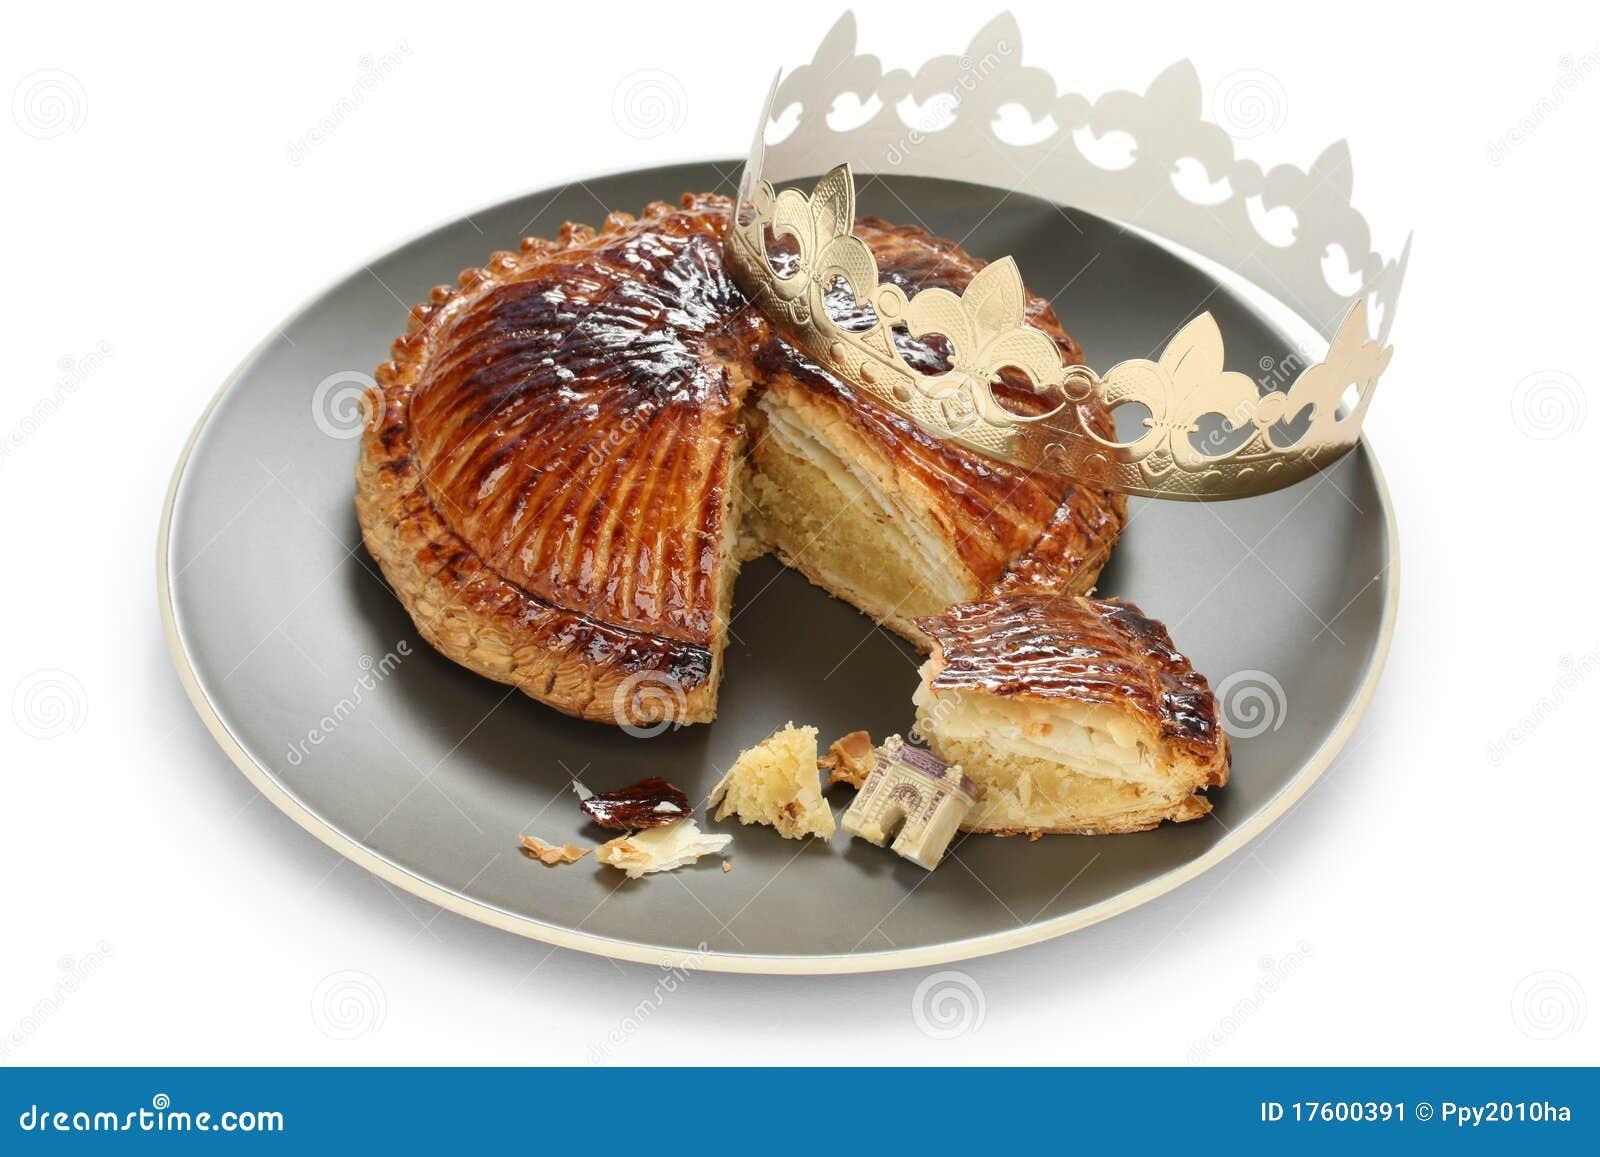 Galette des rois king cake stock image image 17600391 - Galette des rois image ...